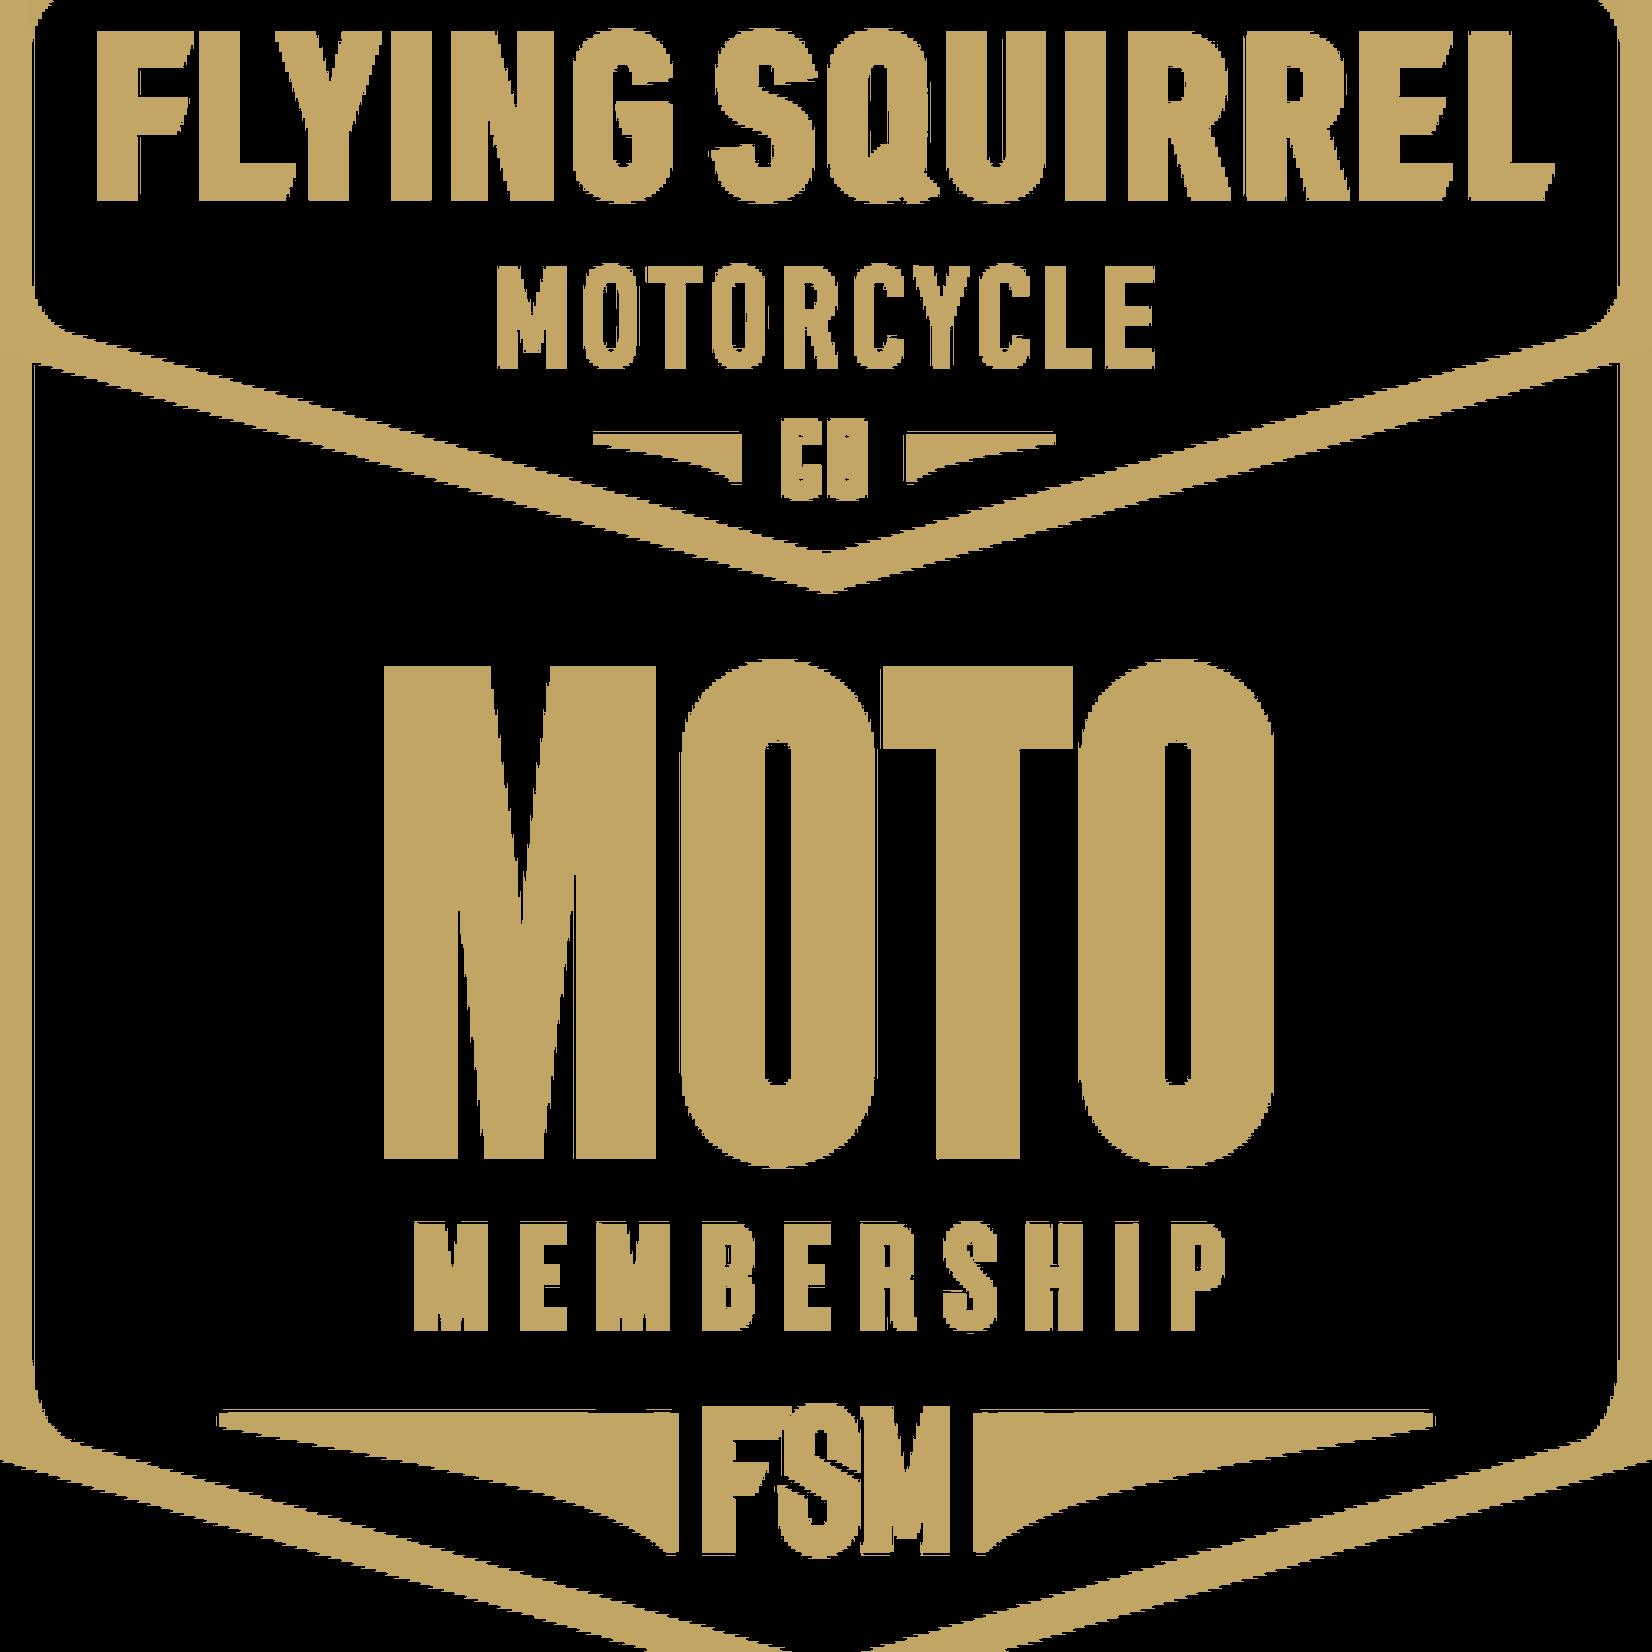 Membership - Moto